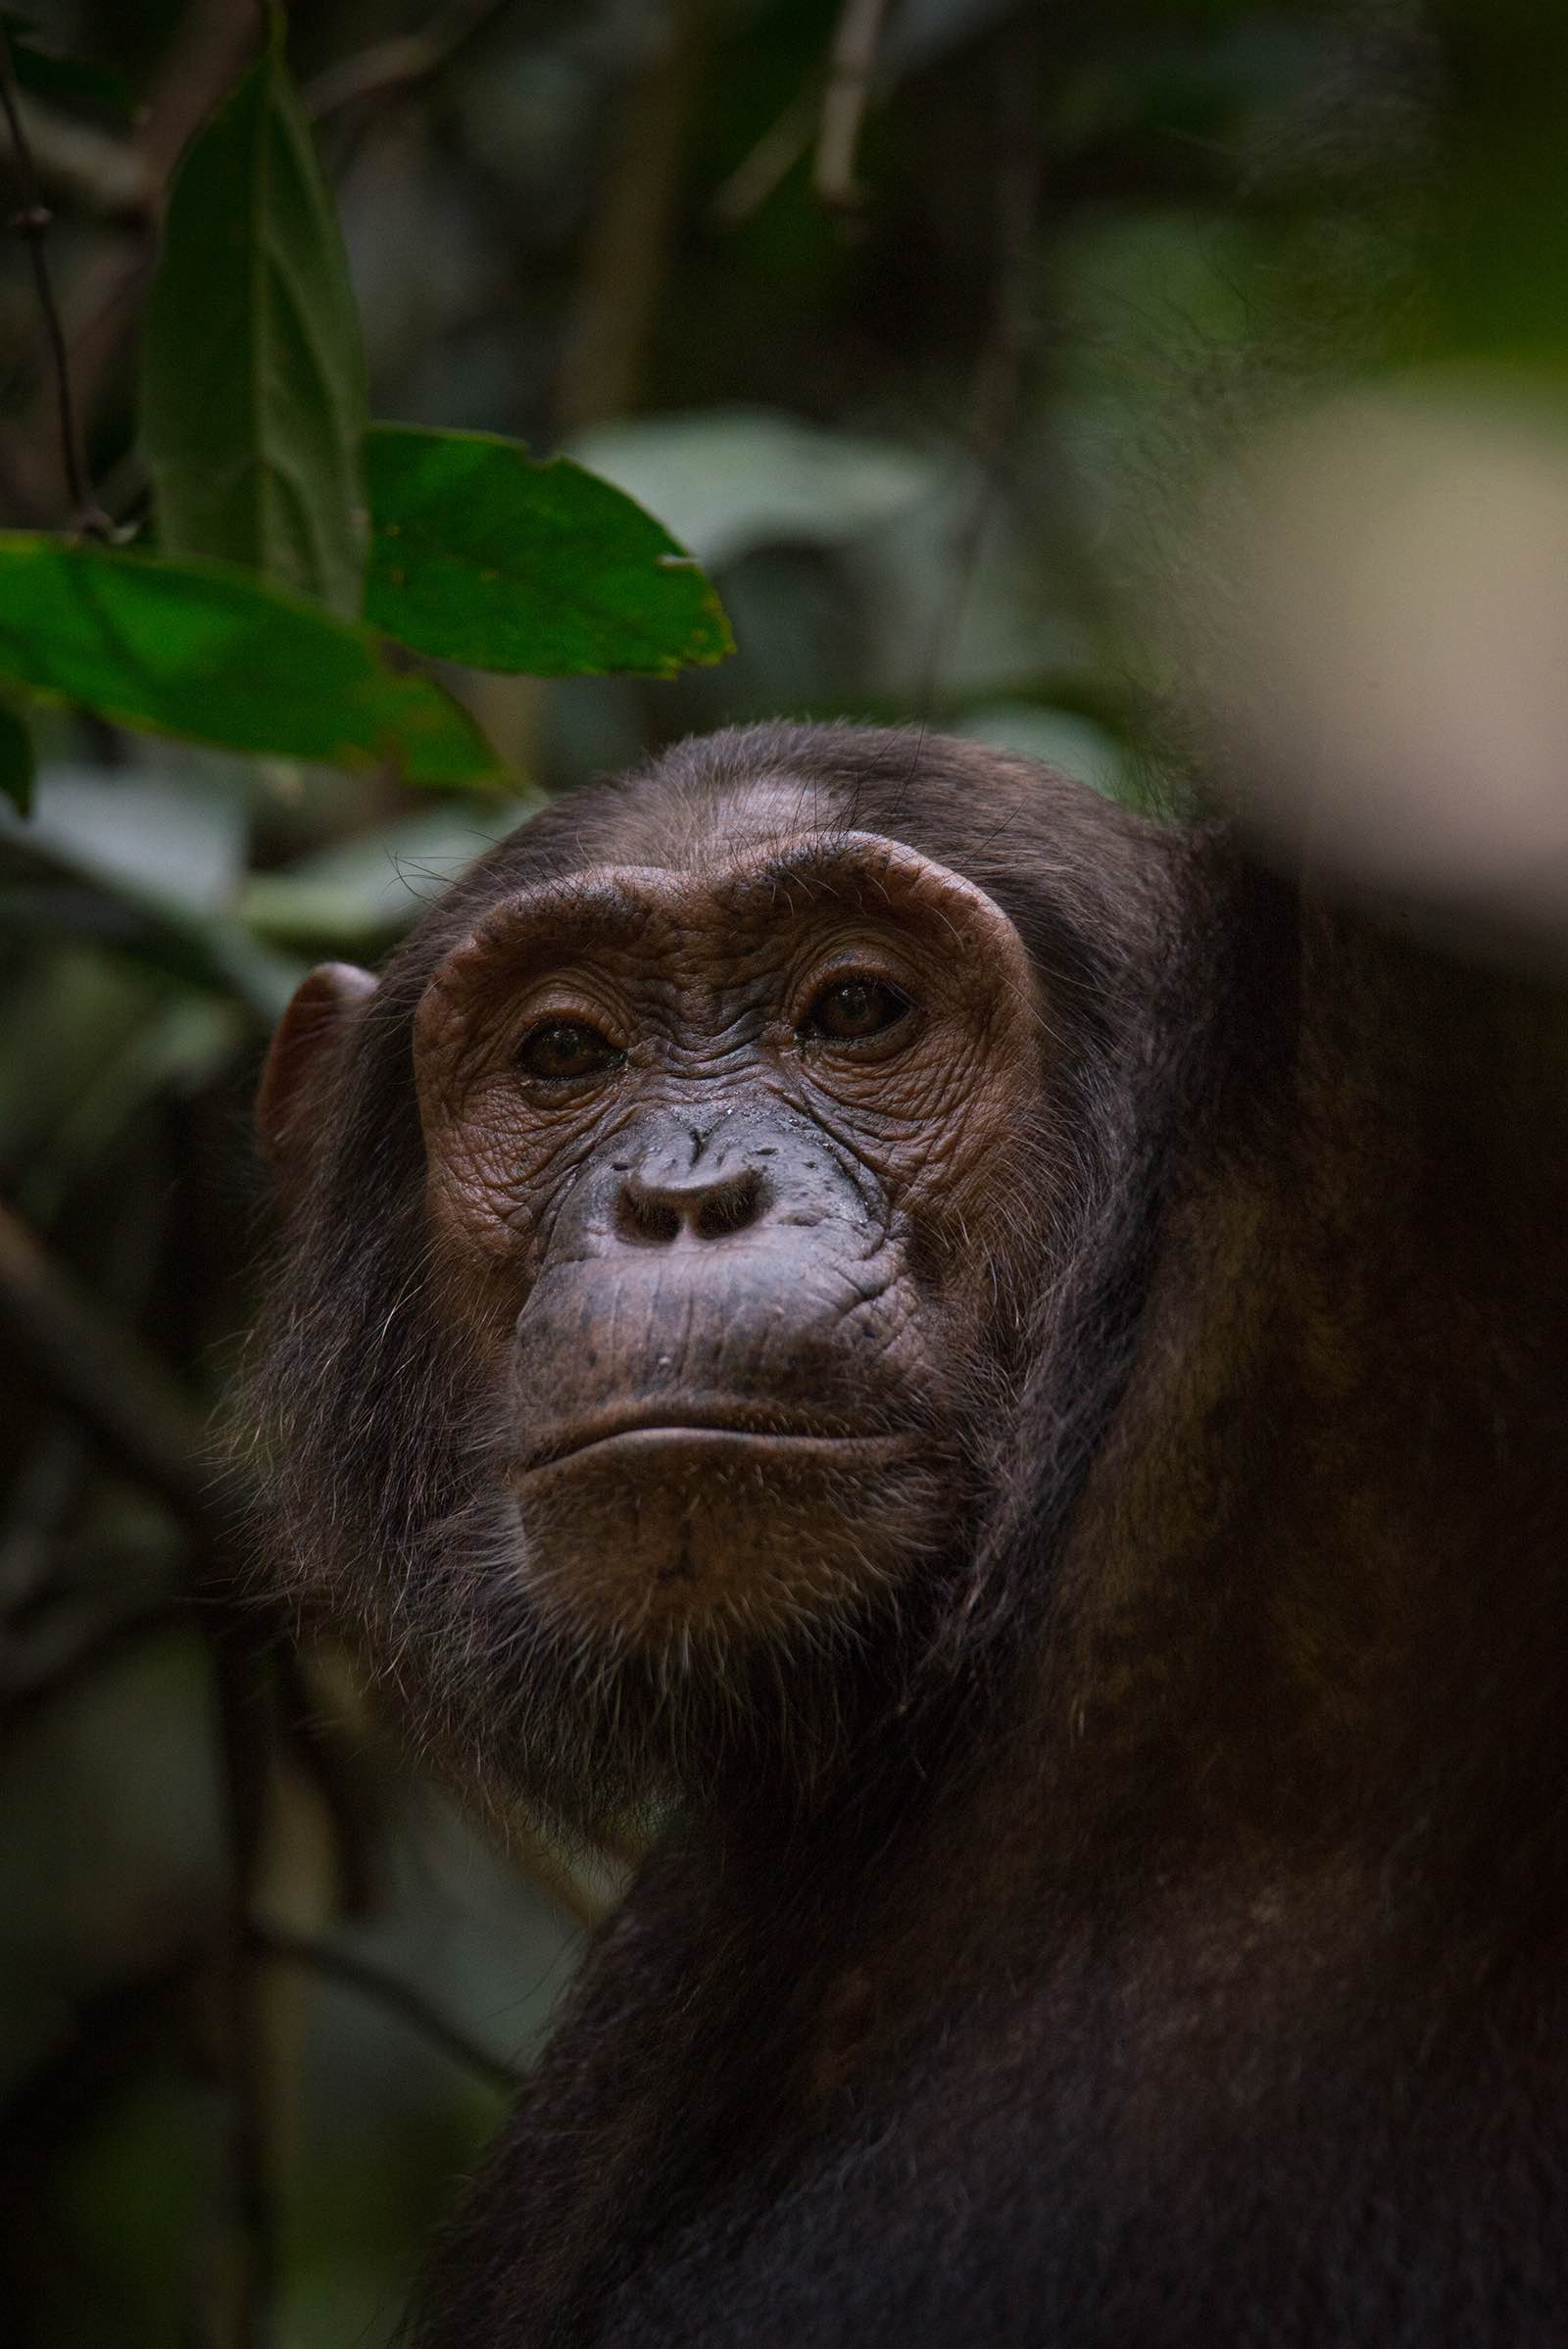 A female chimpanzee gazes down at us